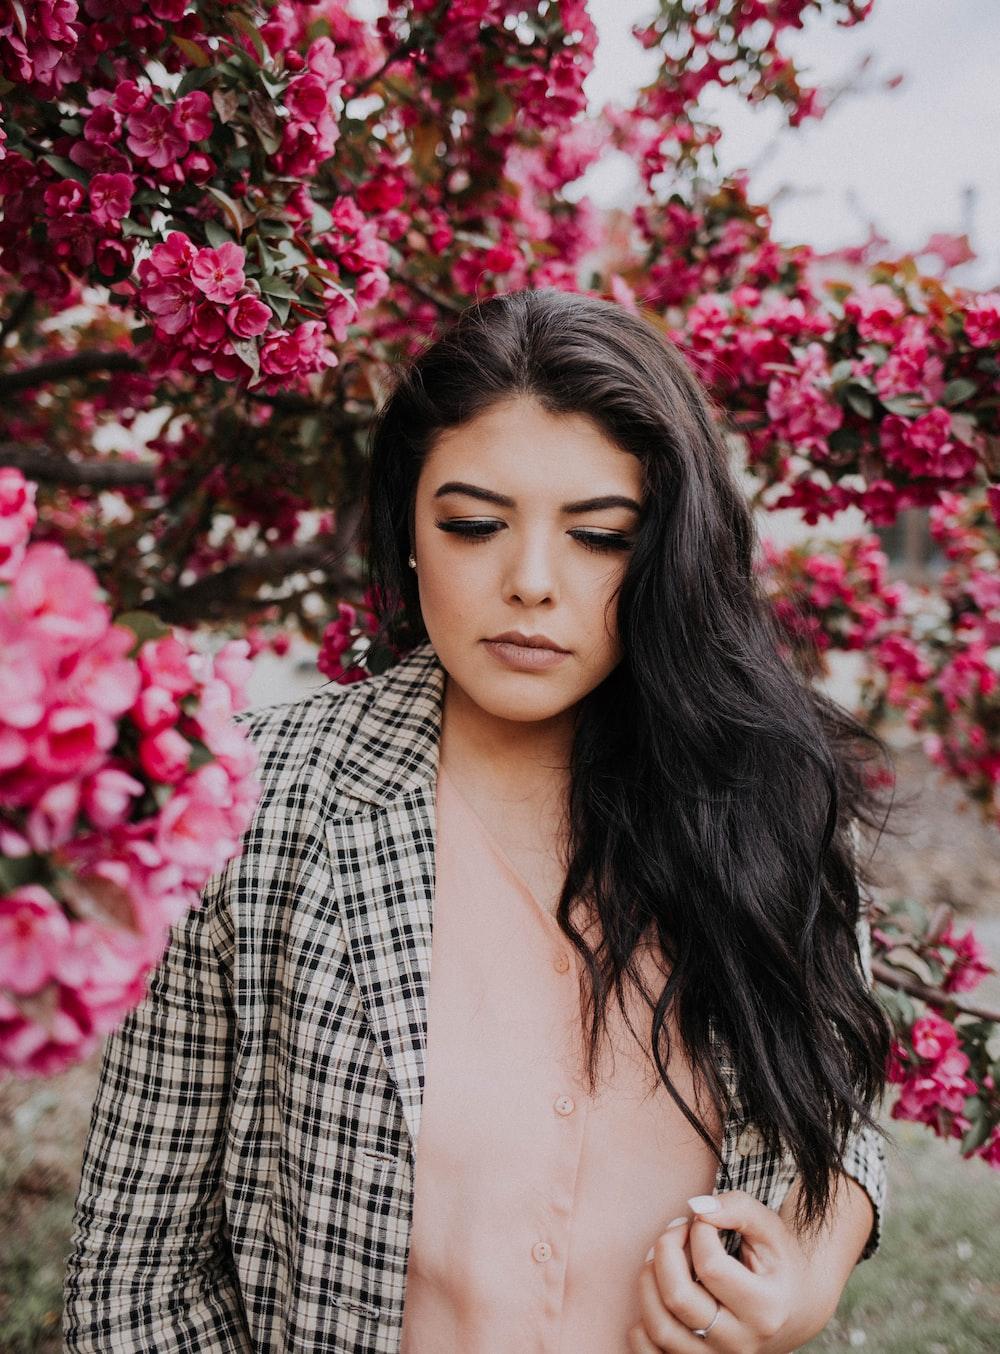 woman standing near pink flowers